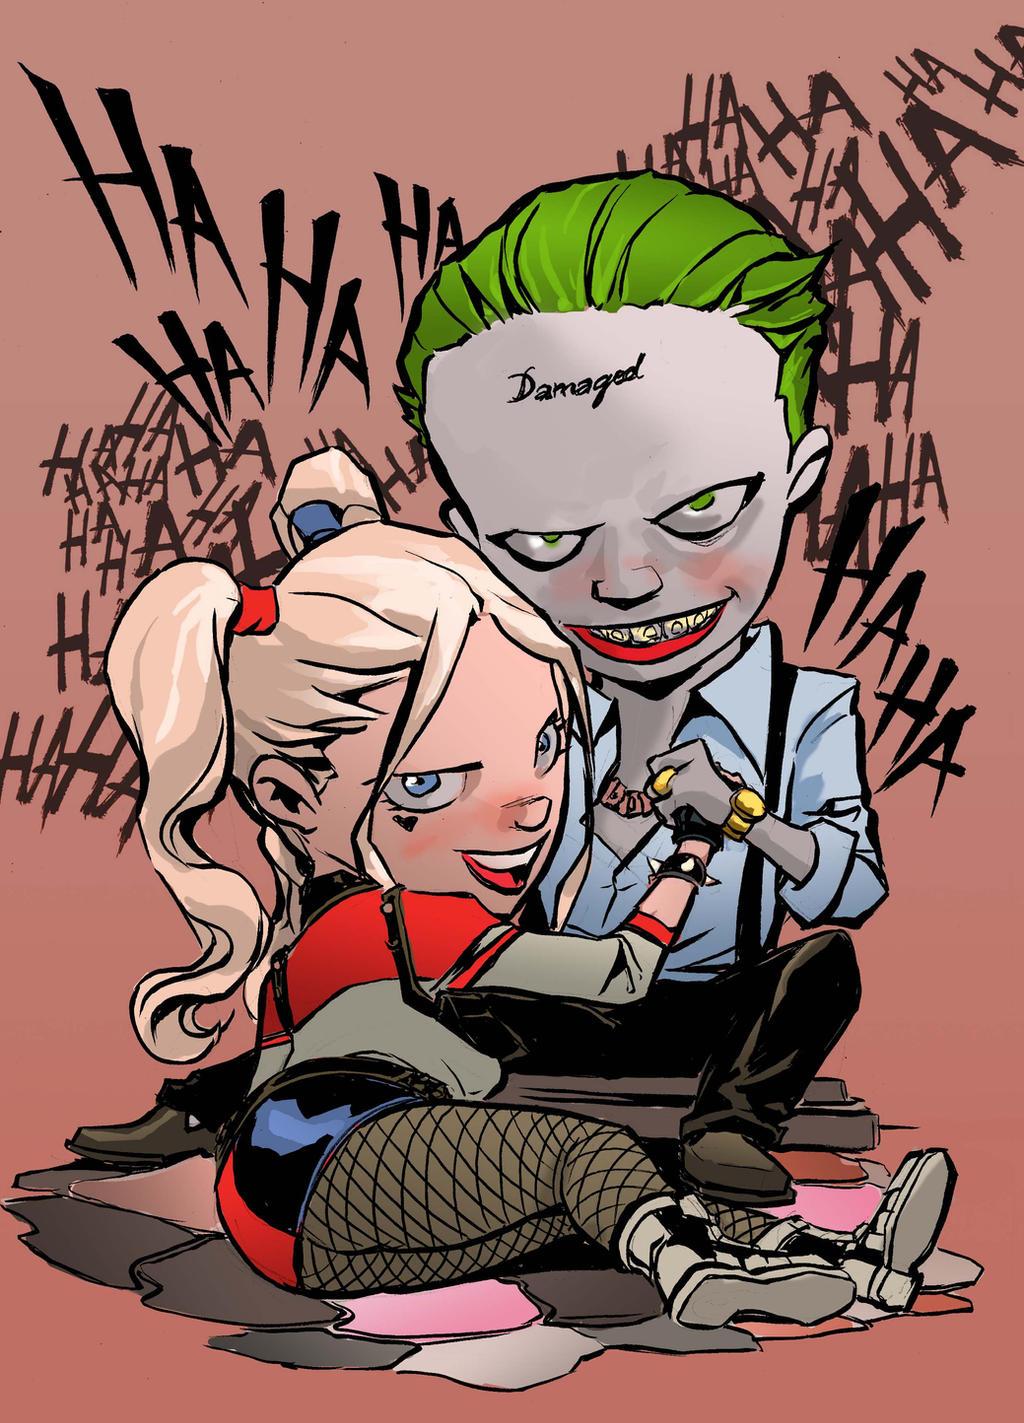 Joker-Harley Quinn chibi by emmanuelxerxjavier on DeviantArt